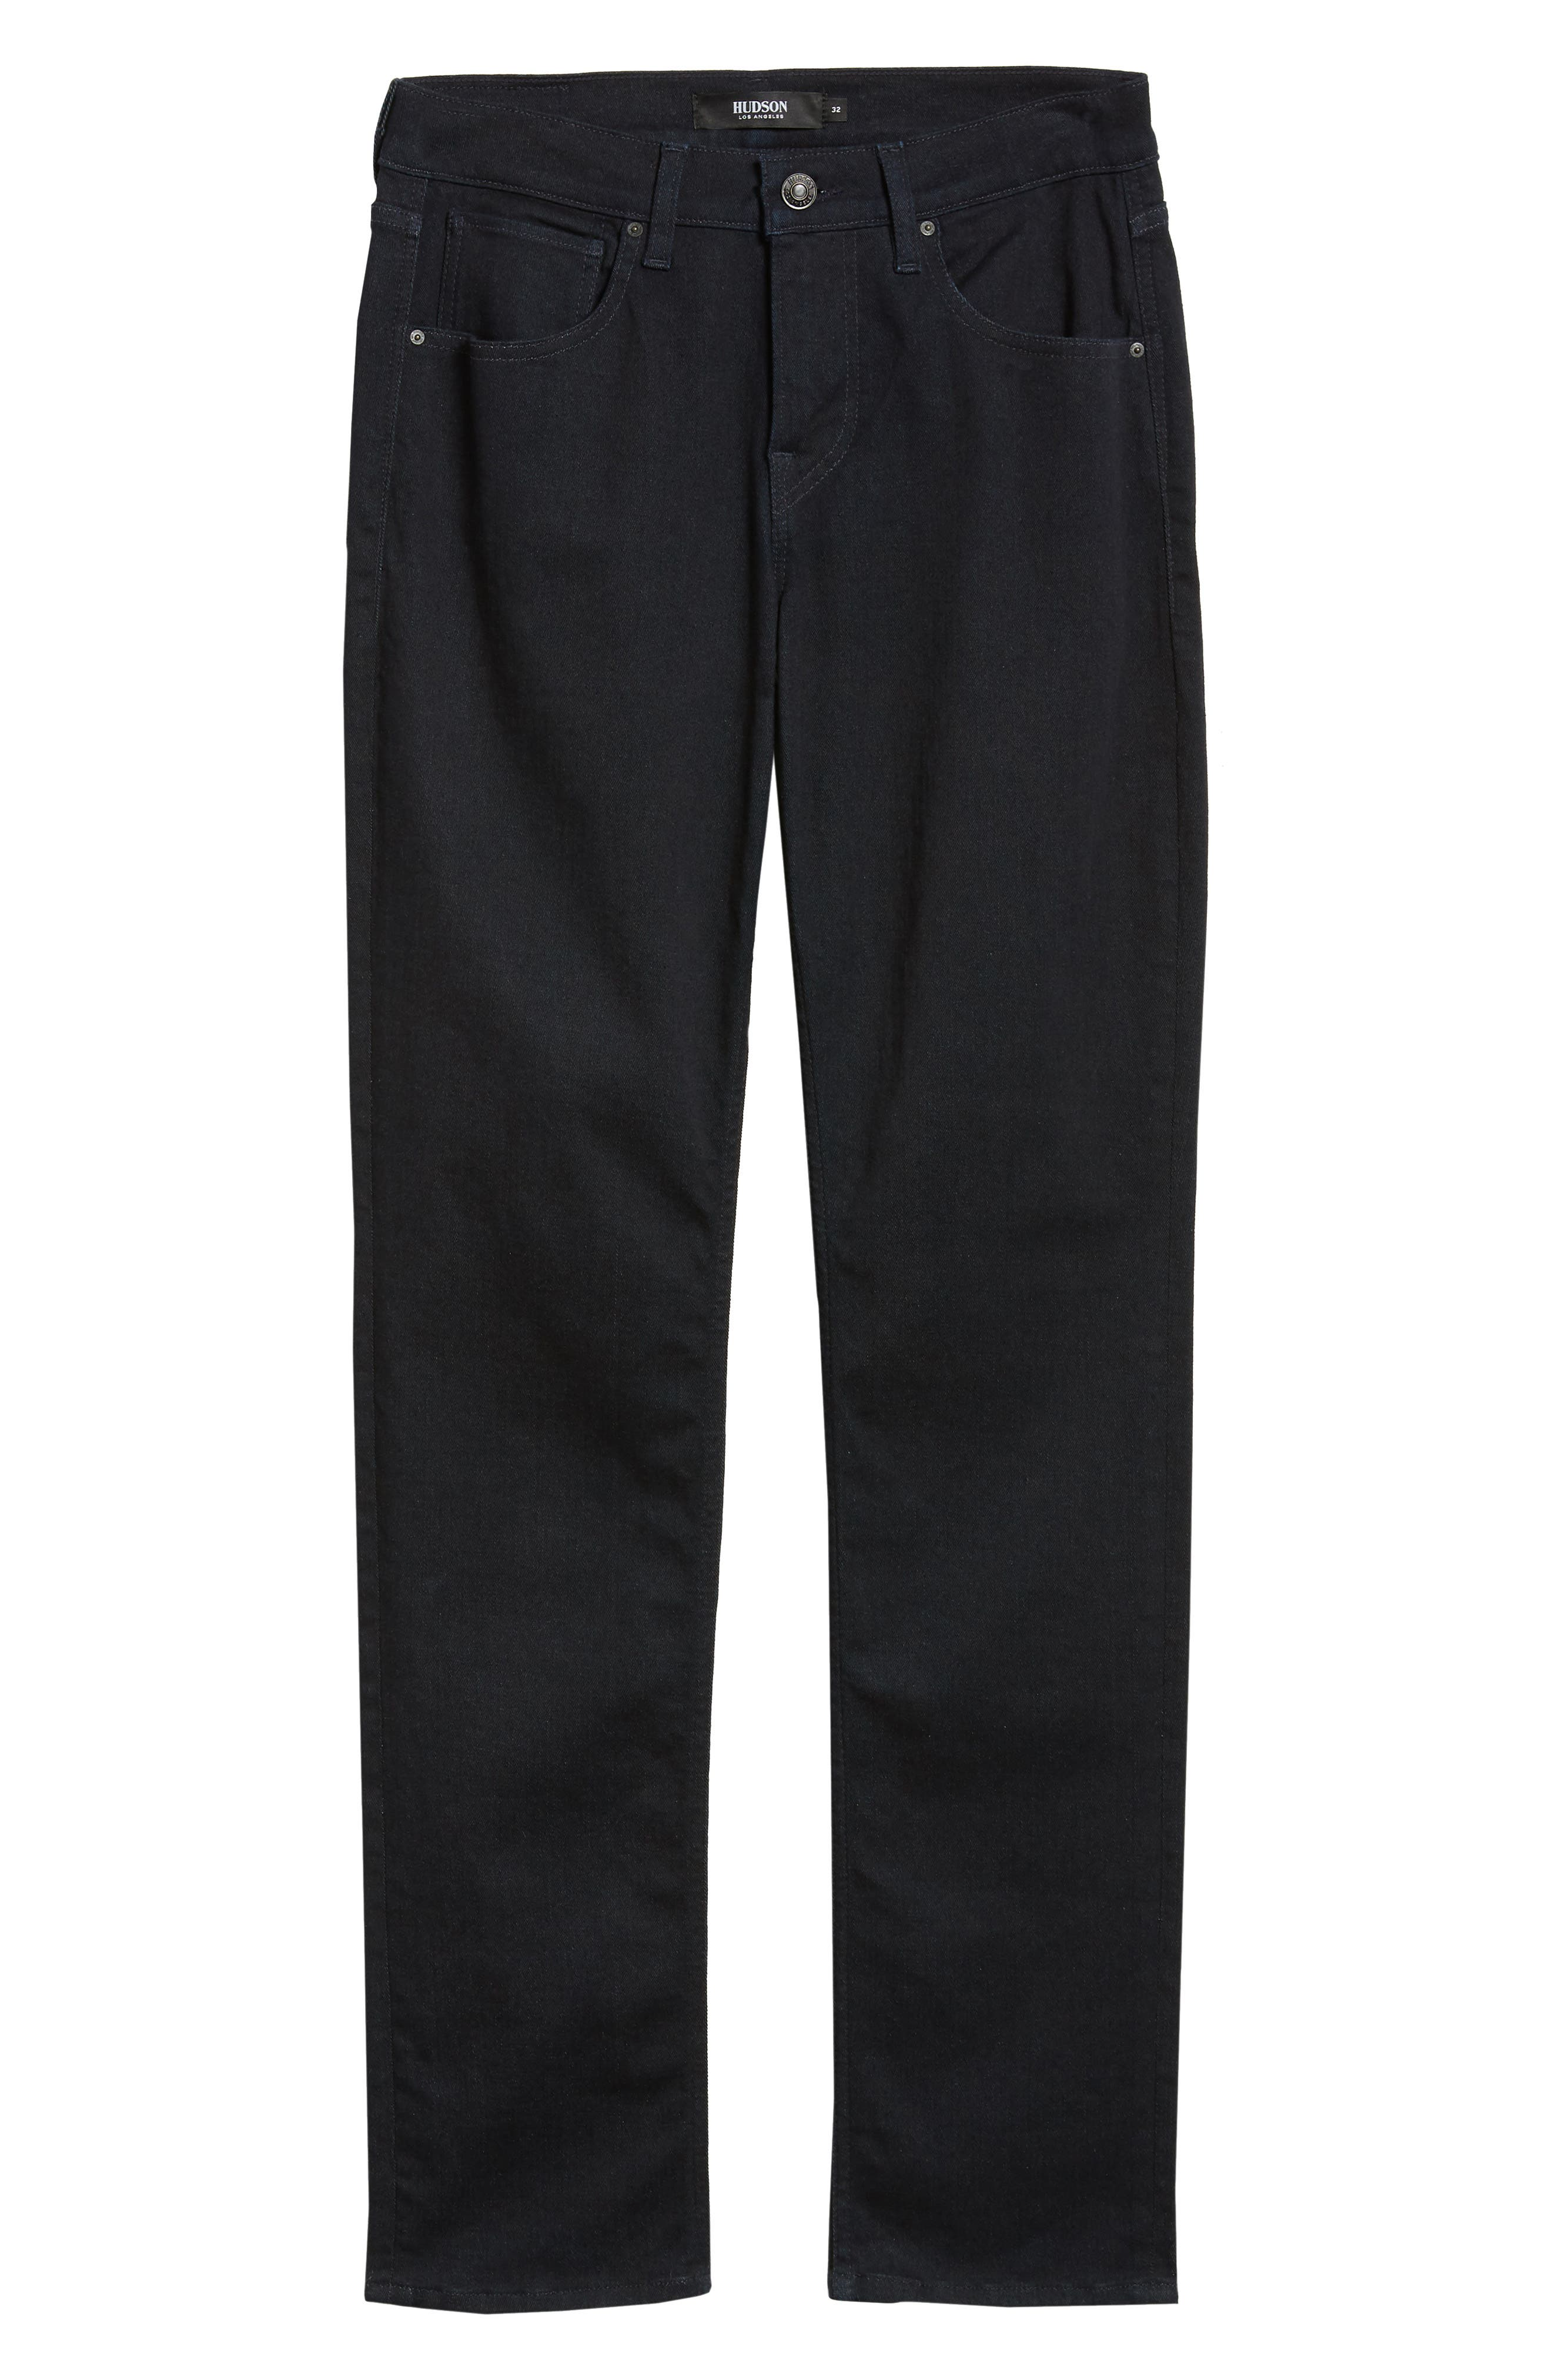 Blake Slim Fit Straight Leg Jeans,                             Alternate thumbnail 6, color,                             WILLIAMS